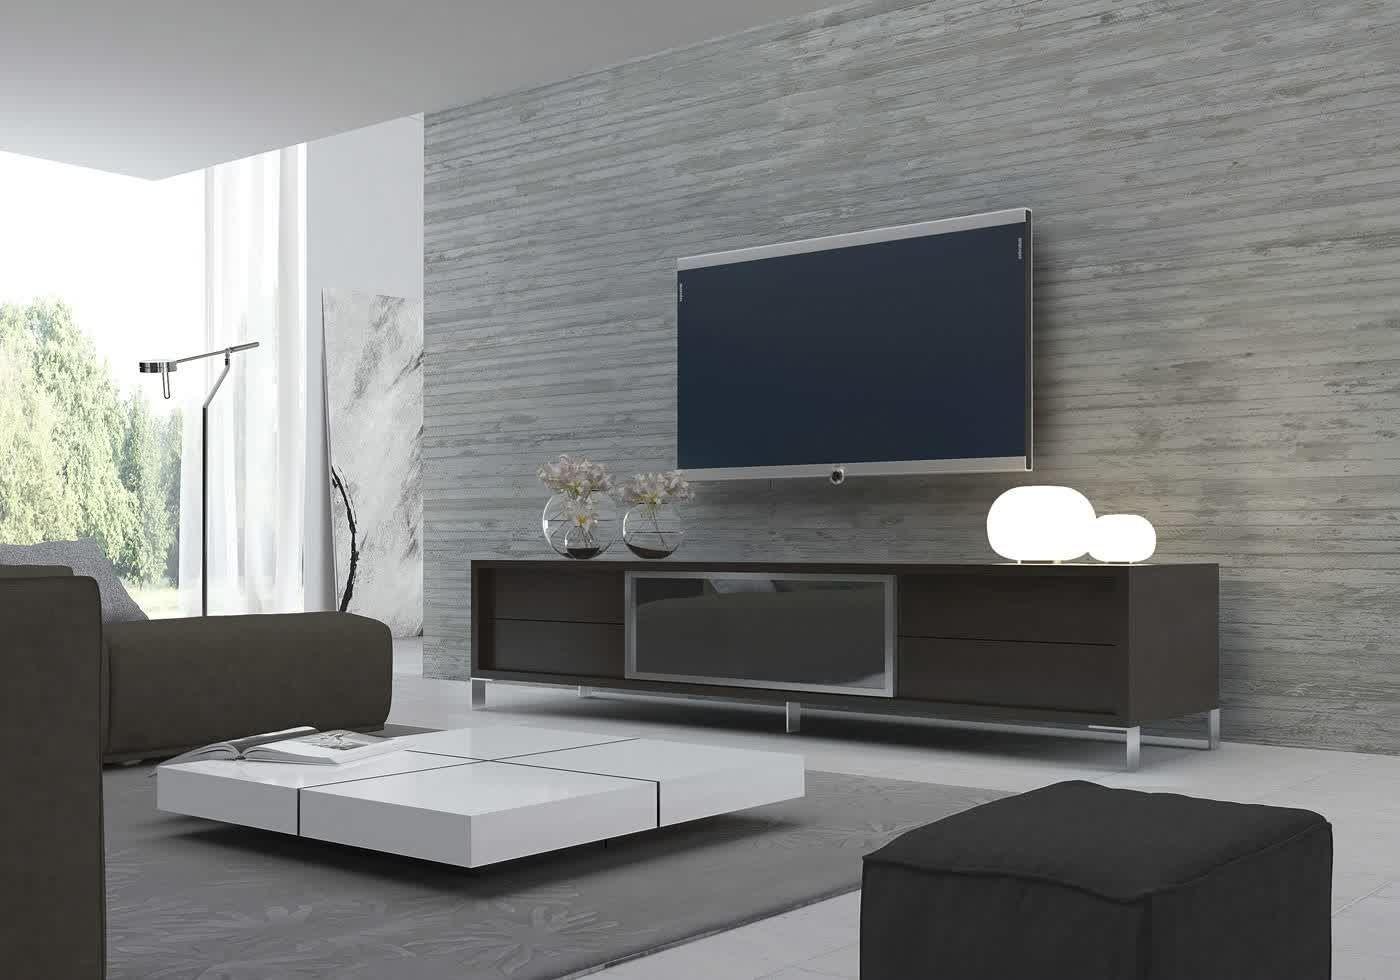 Tv Wall Mount Design Ideas  Home Decor  Pinterest  Tv Wall Pleasing Tv Wall Mount Designs For Living Room Inspiration Design